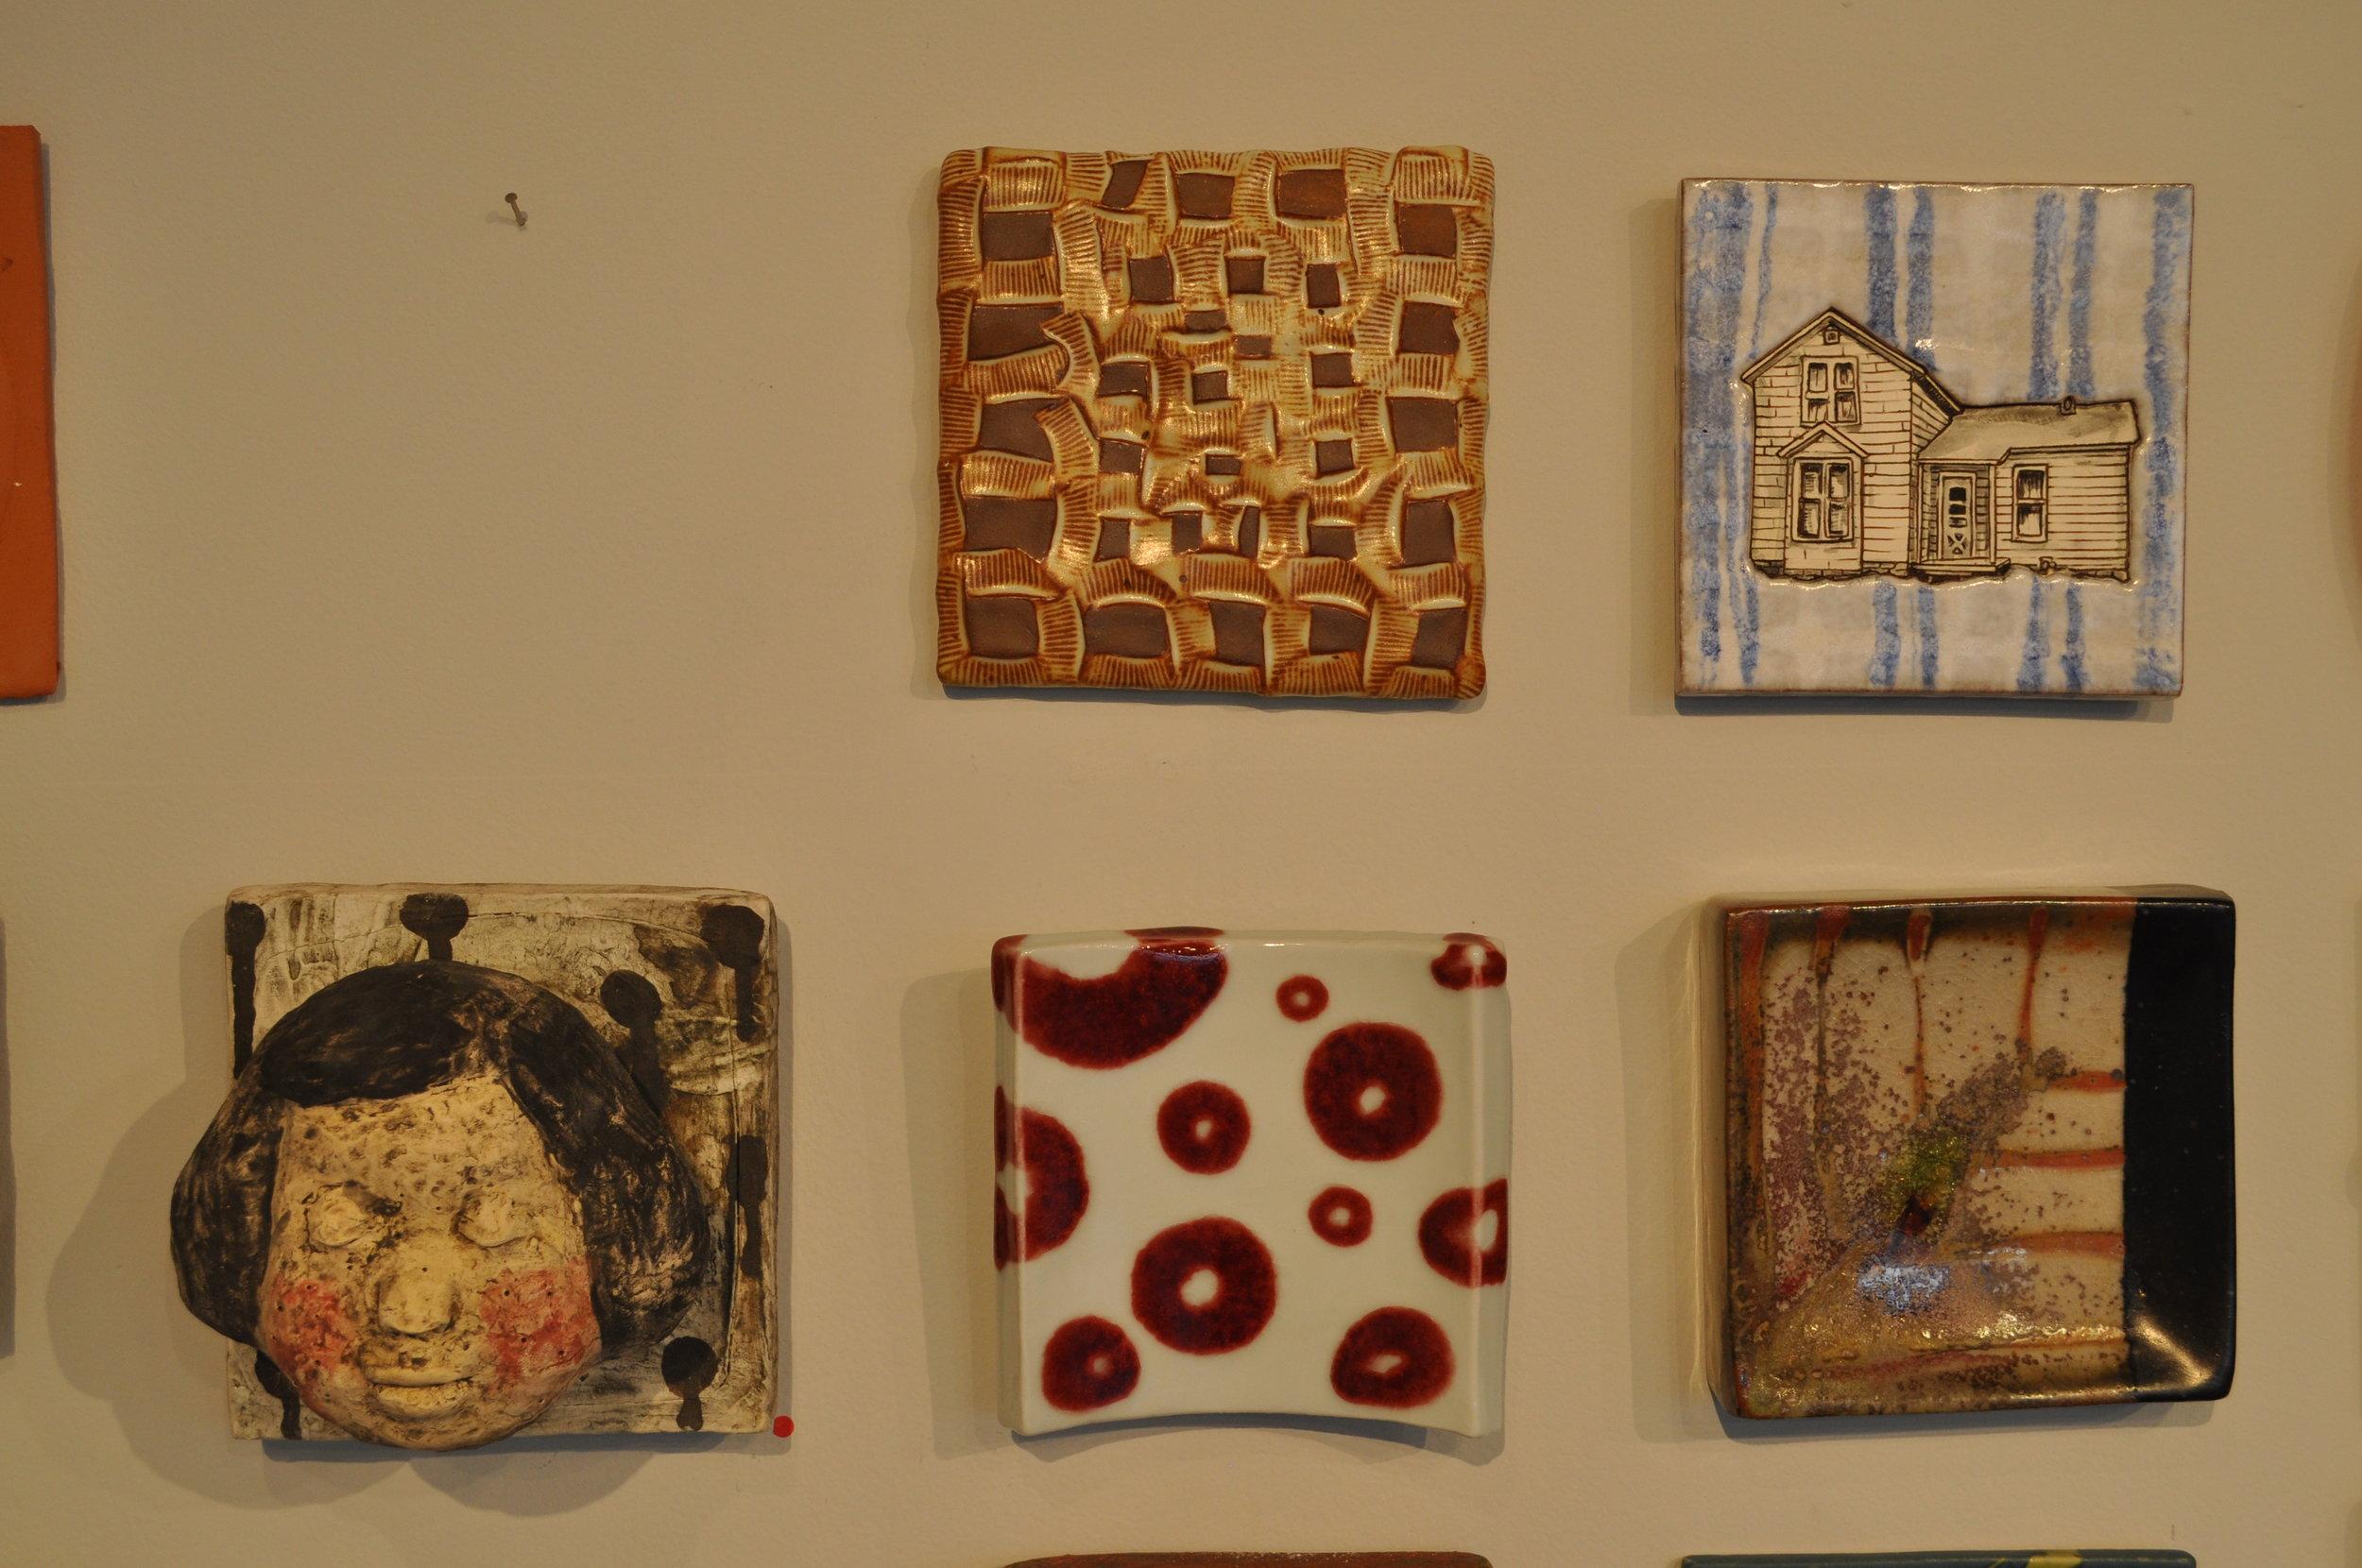 "1.  Peter Arnow,  Untitled  $50  2. Jessica Brandl,  Blue House  $100  3. Kensuke Yamada,  Wall Tile 1  (SOLD)  4.  Sarah Koster,  Untitled   5.  Matthew Hyleck,  Tile 6"" x 6"" - Chevron  (SOLD)"